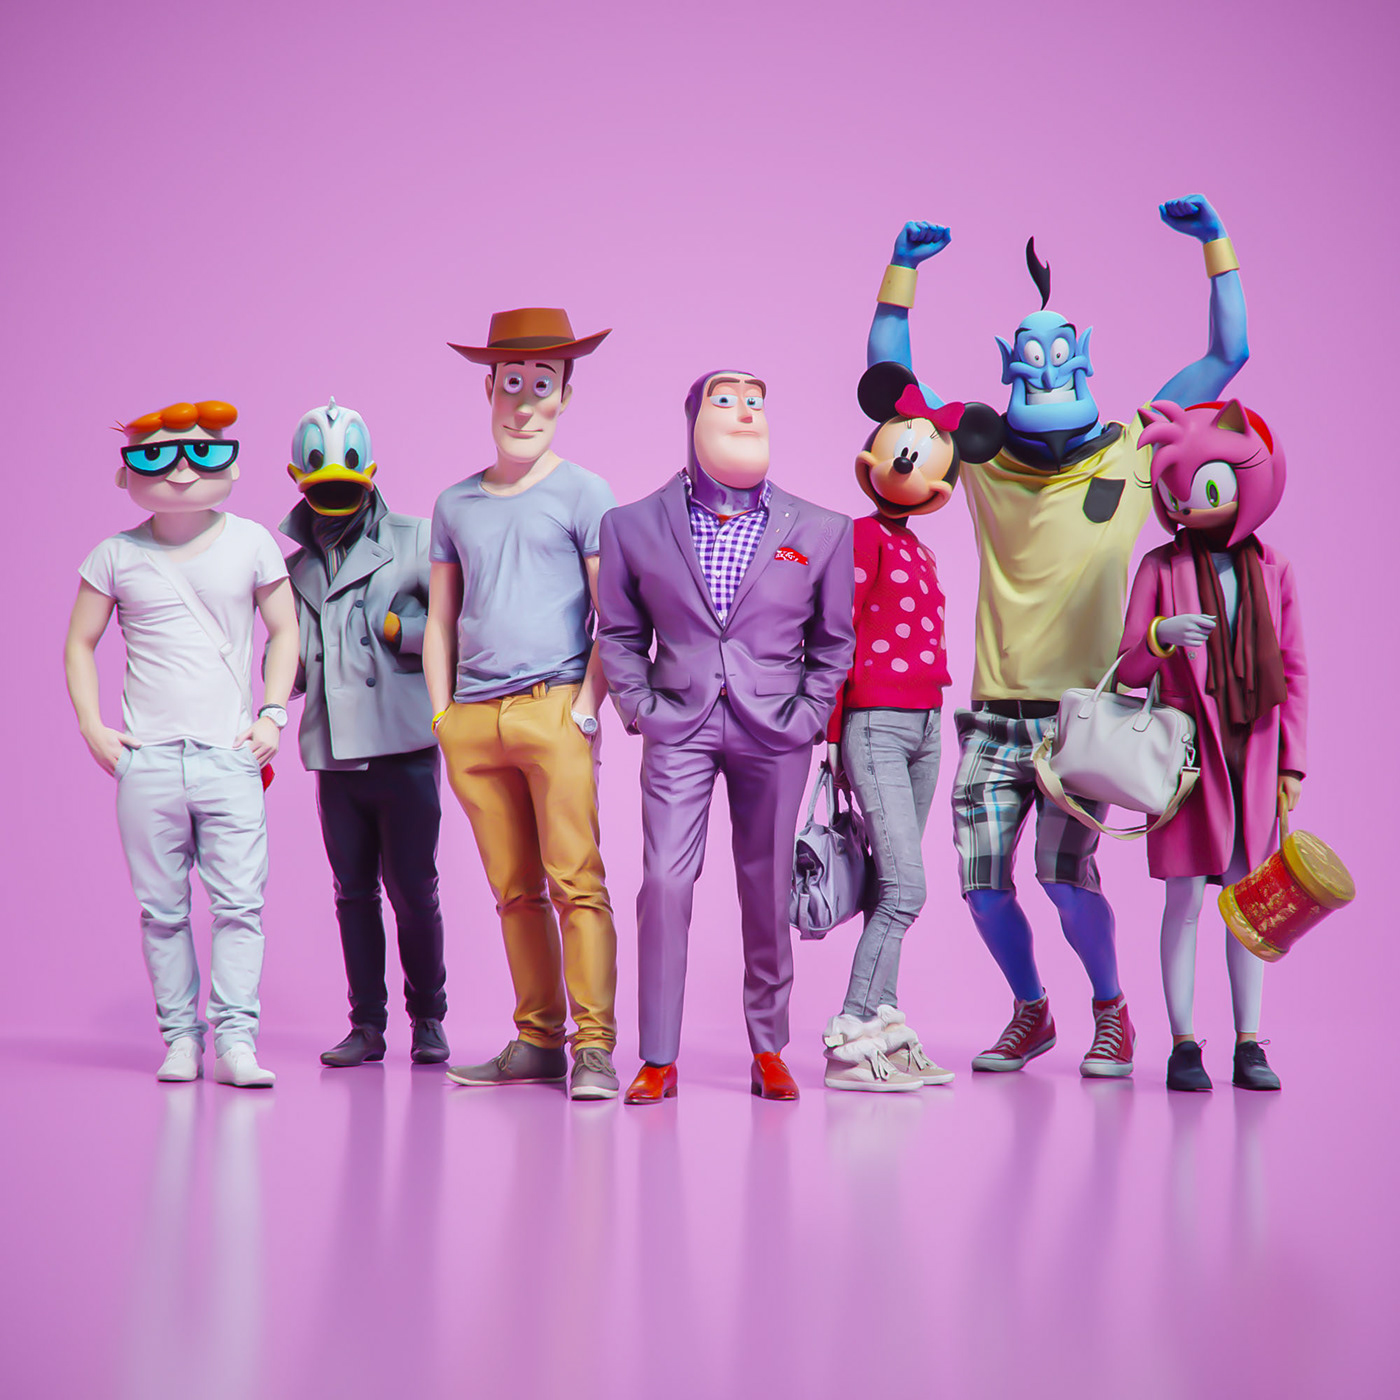 cartoon halawany bizarre buzz lightyear characters cute funny game realtoons toy story